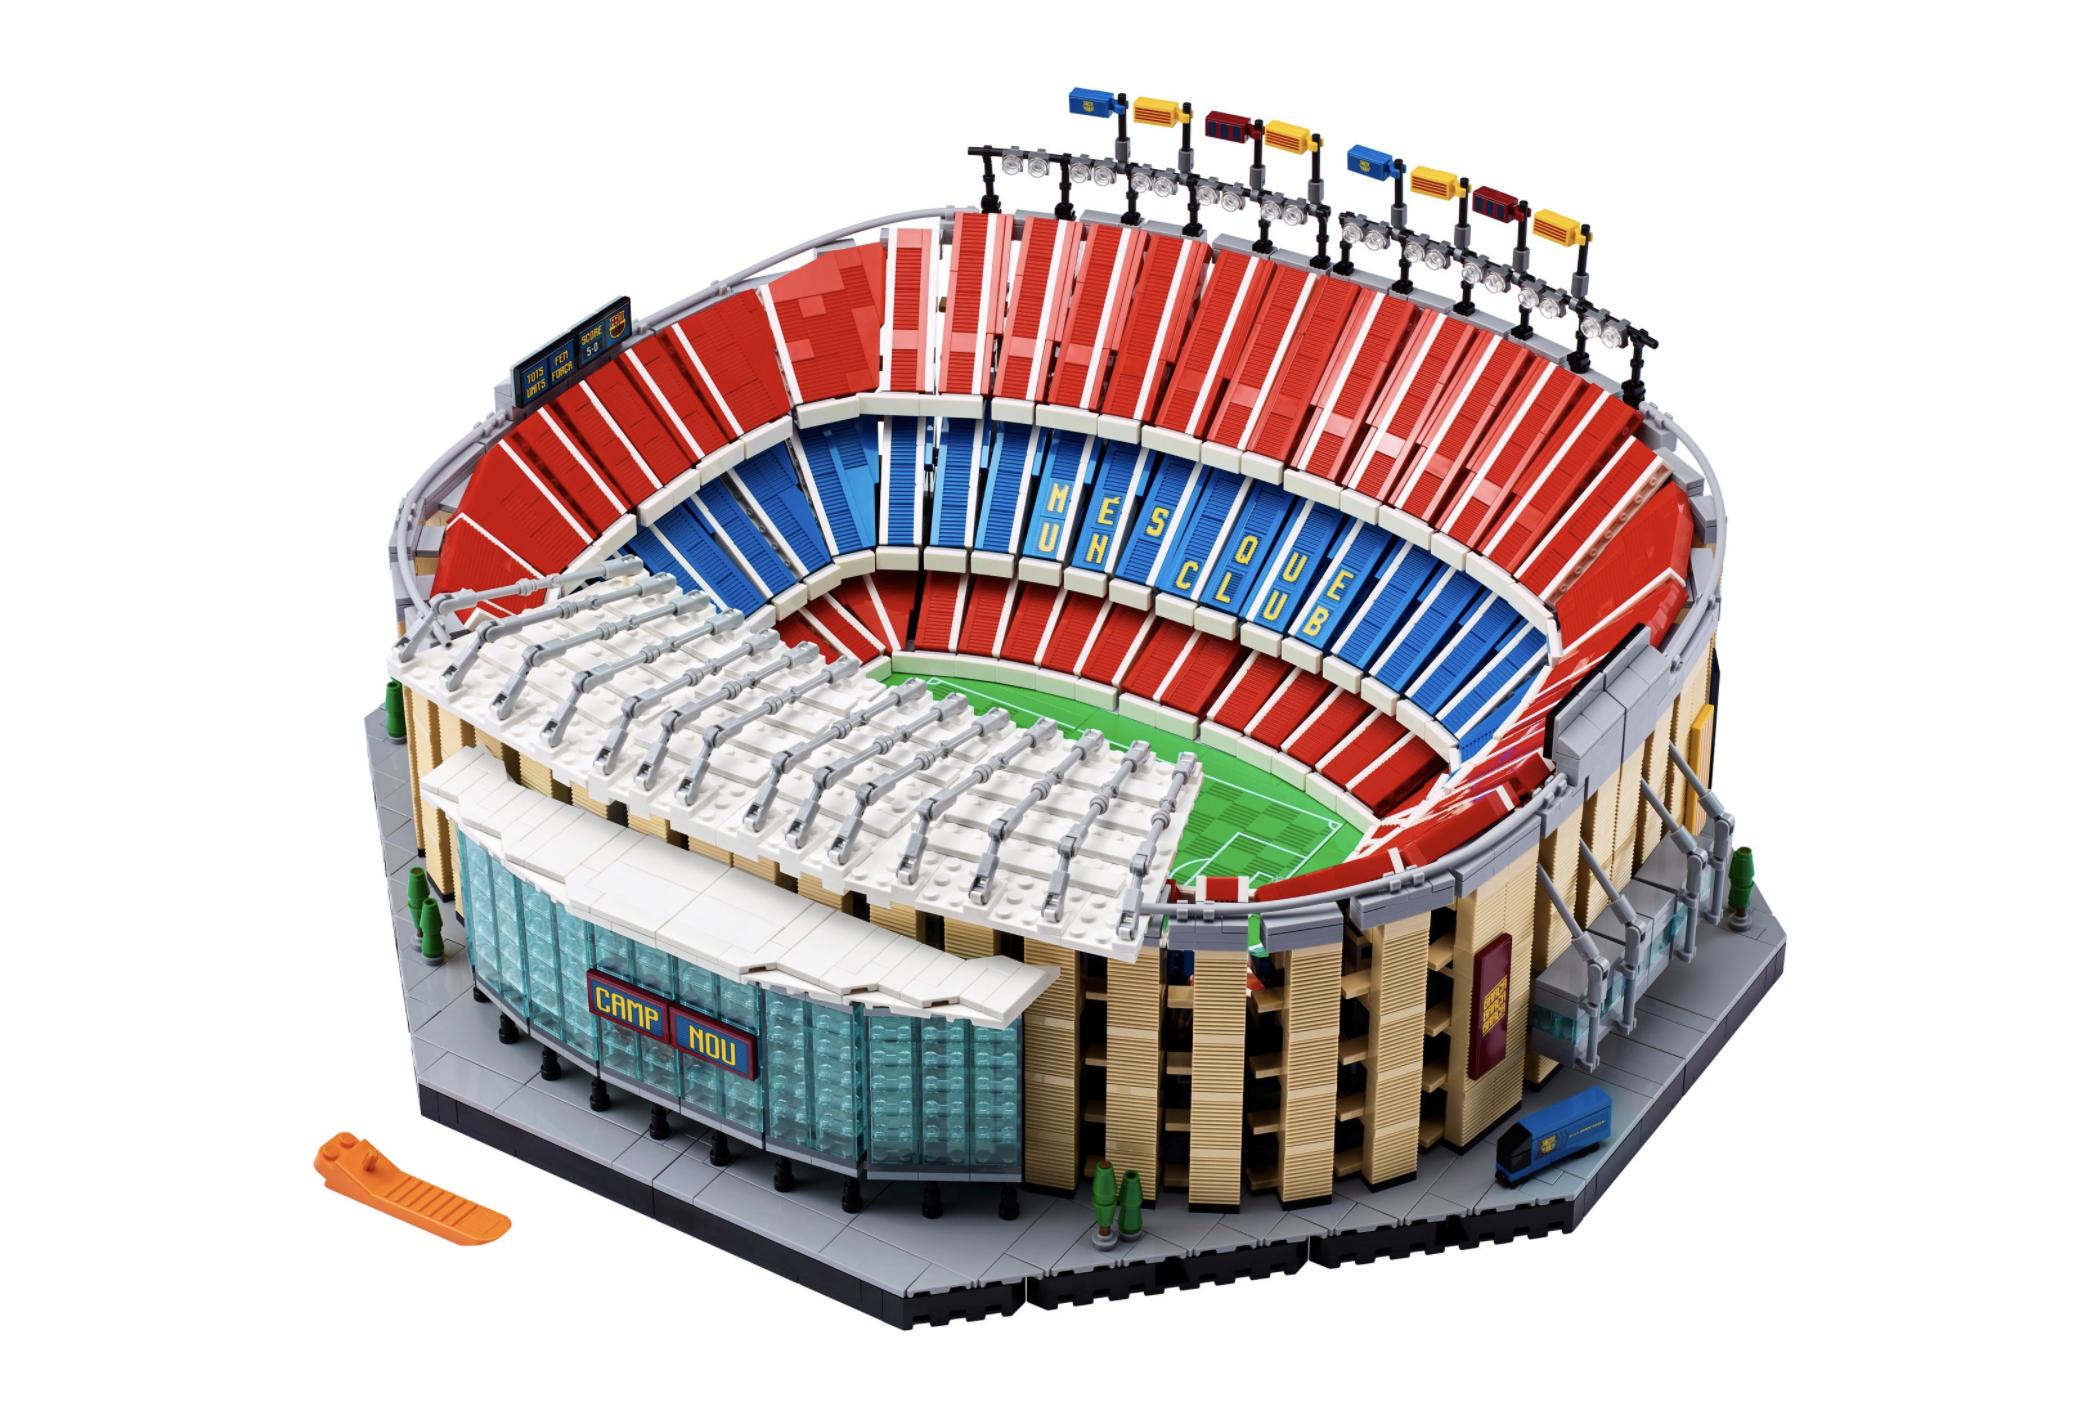 Lego football stadium